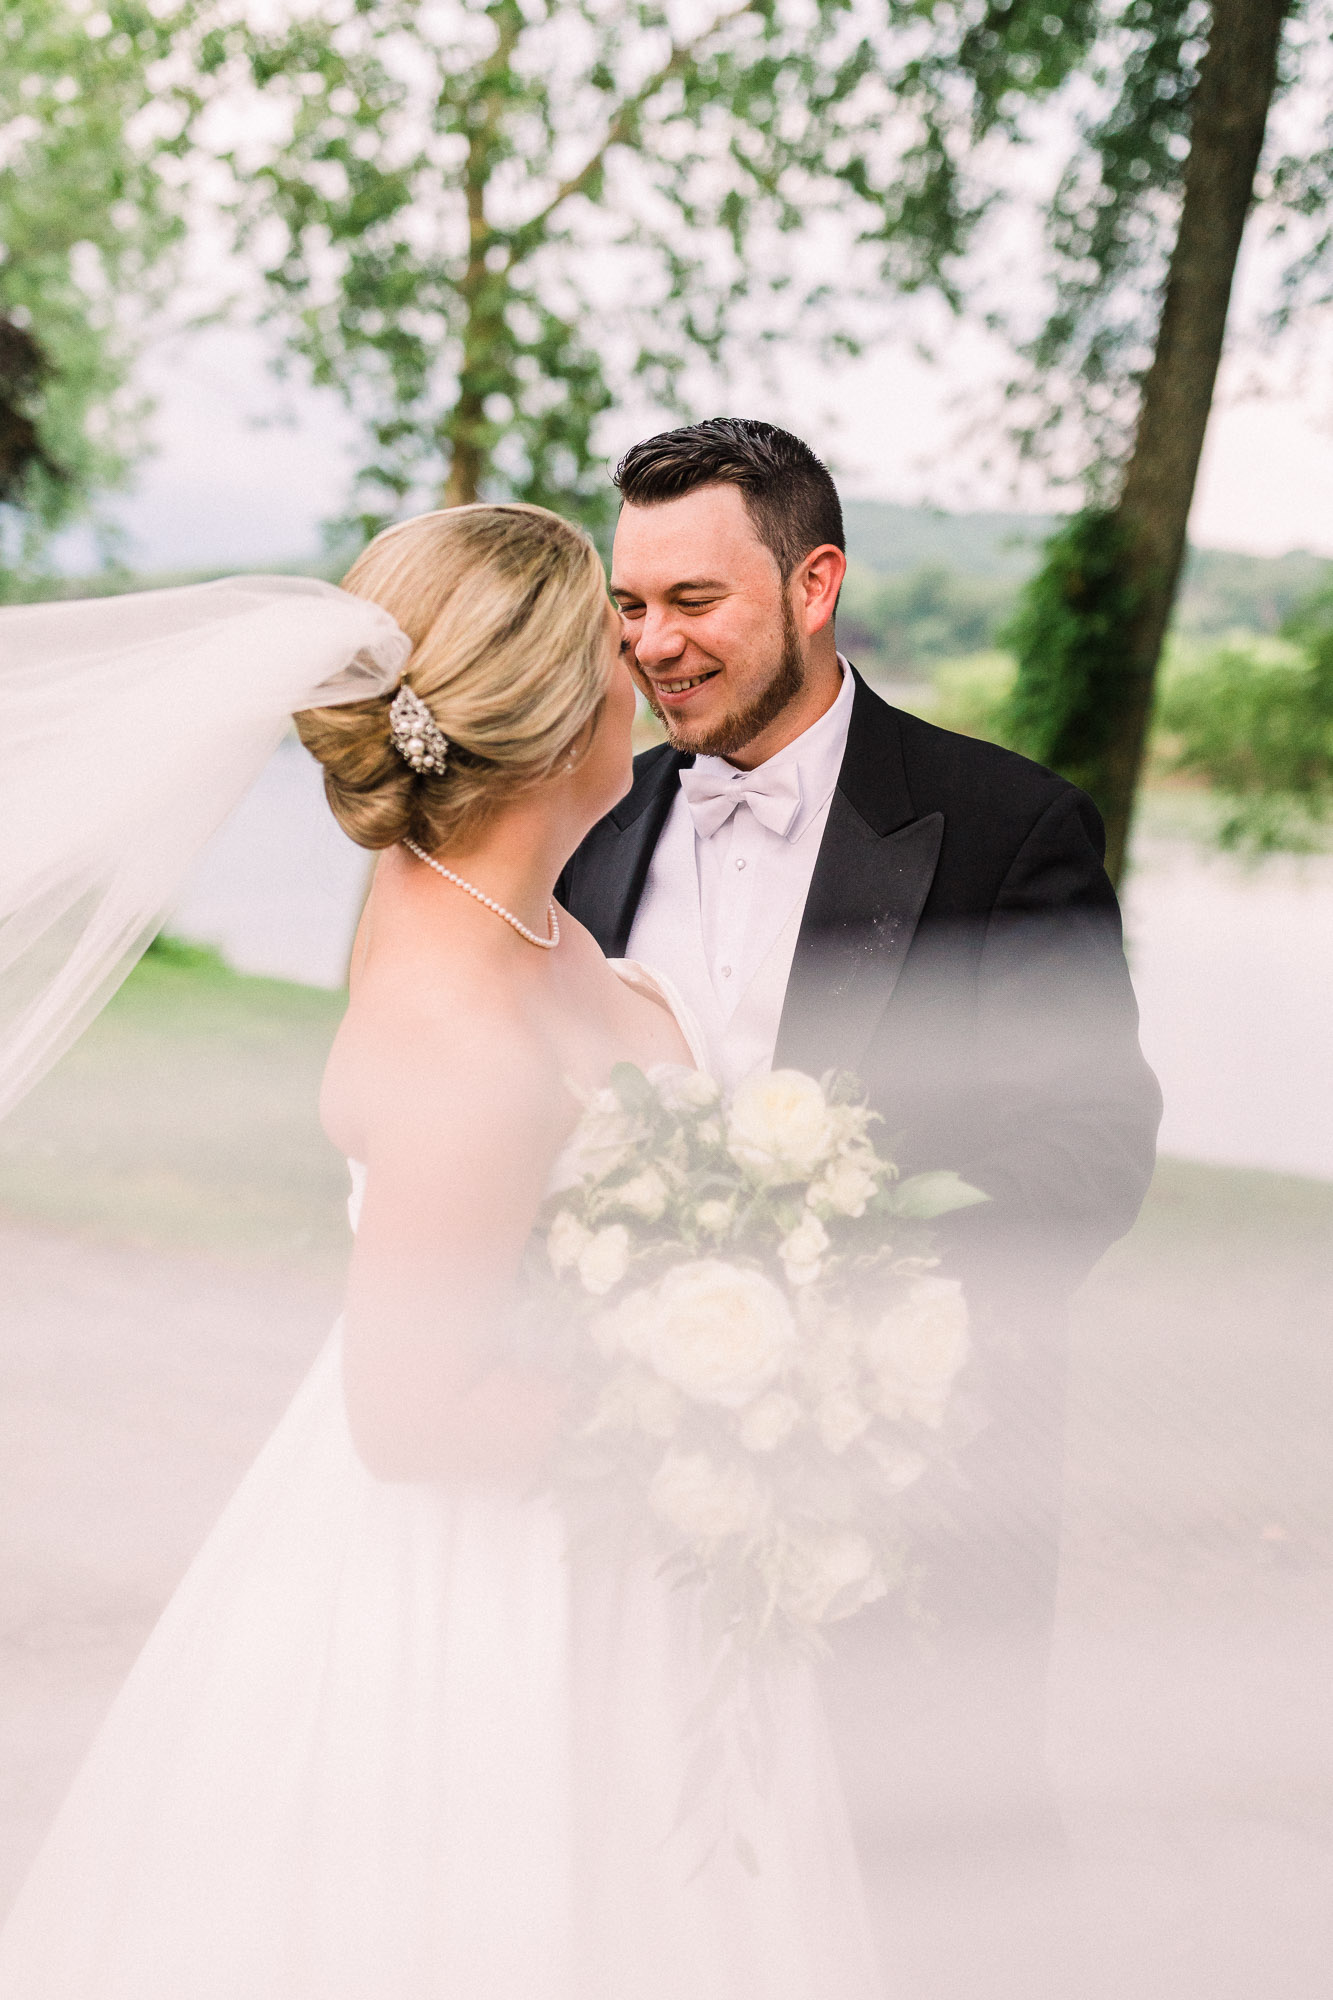 isle-of-que-wedding-6916.jpg